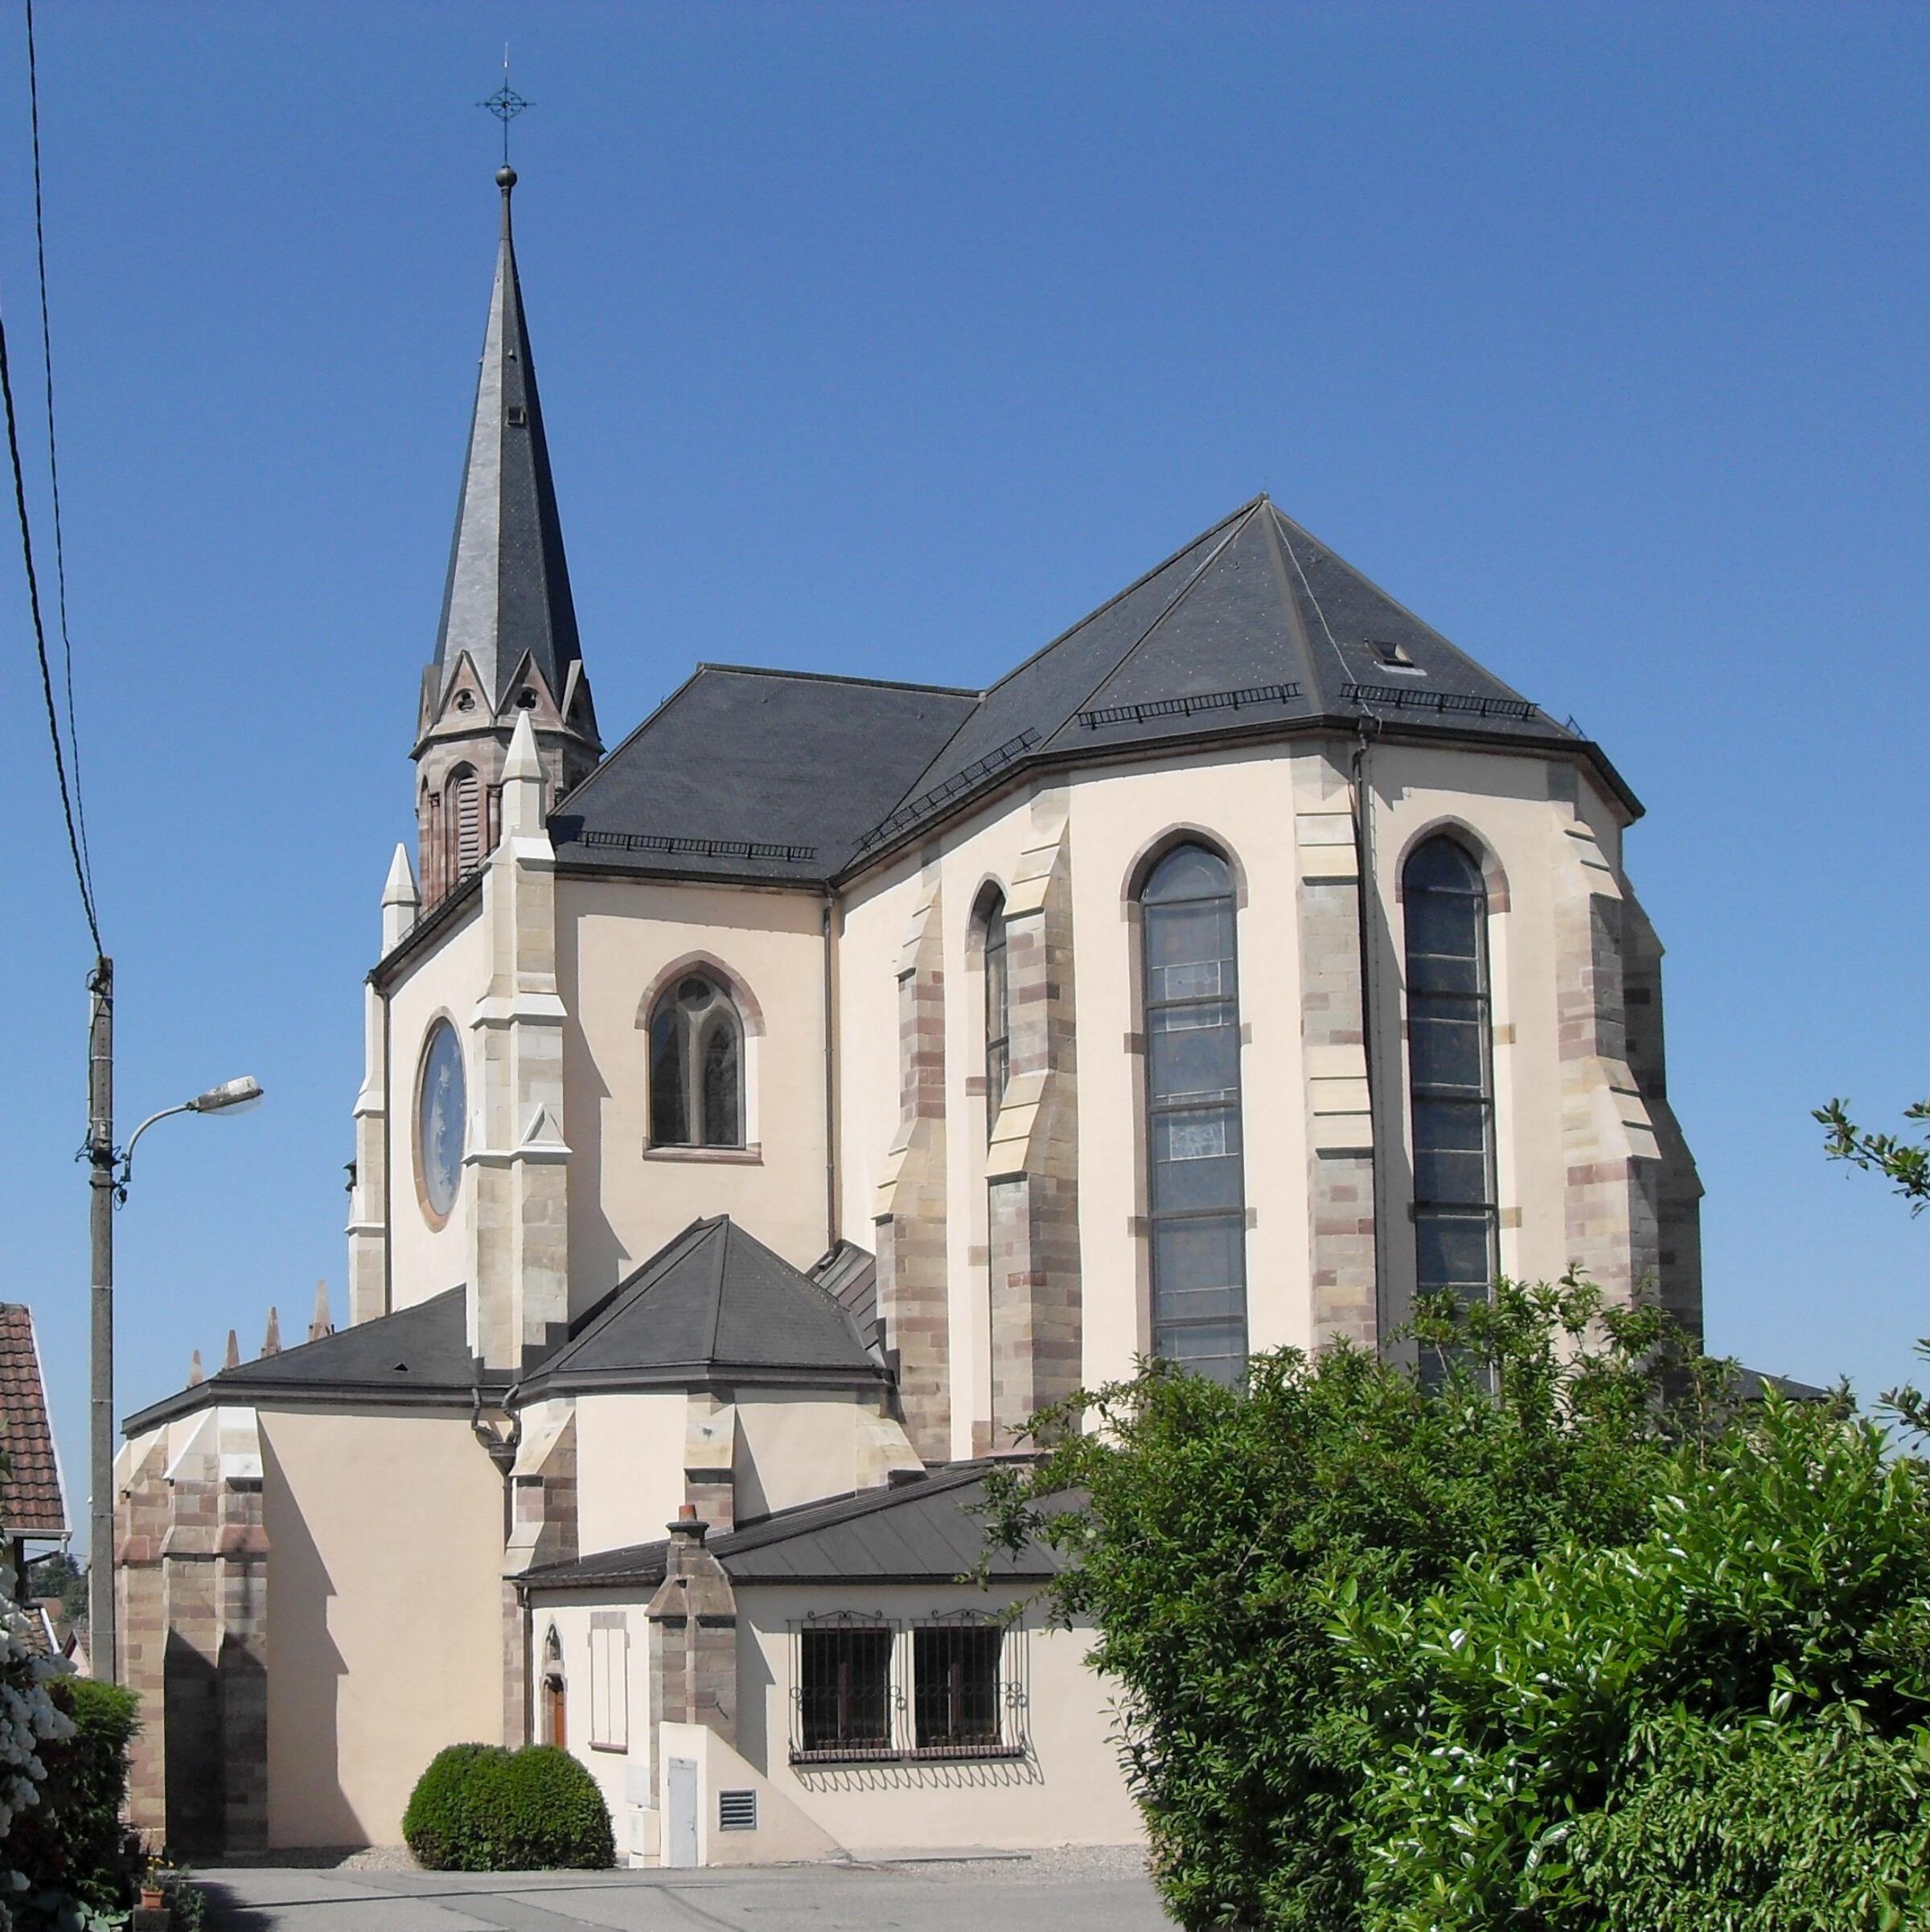 Morschwiller-le-Bas France  City new picture : Morschwiller le Bas, Eglise Saint Ulrich 2 Wikimedia ...